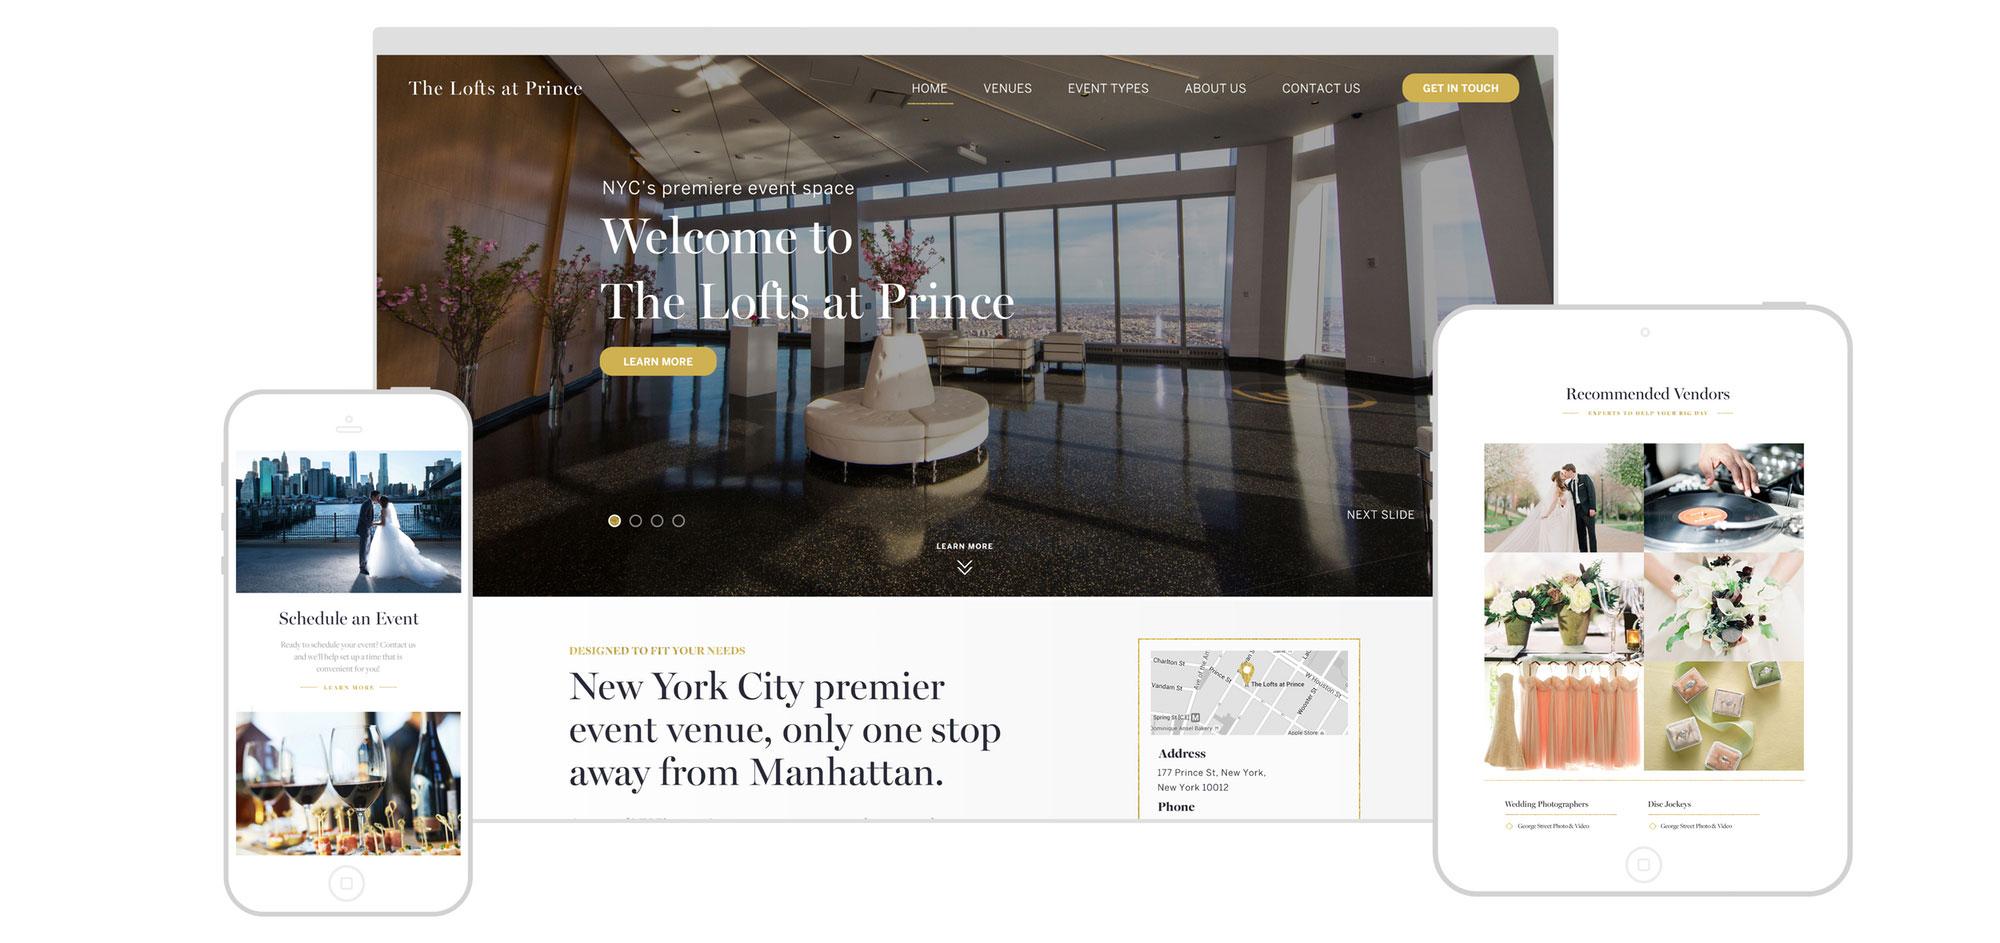 Web Design | The Lofts at Prince - Responsive Design